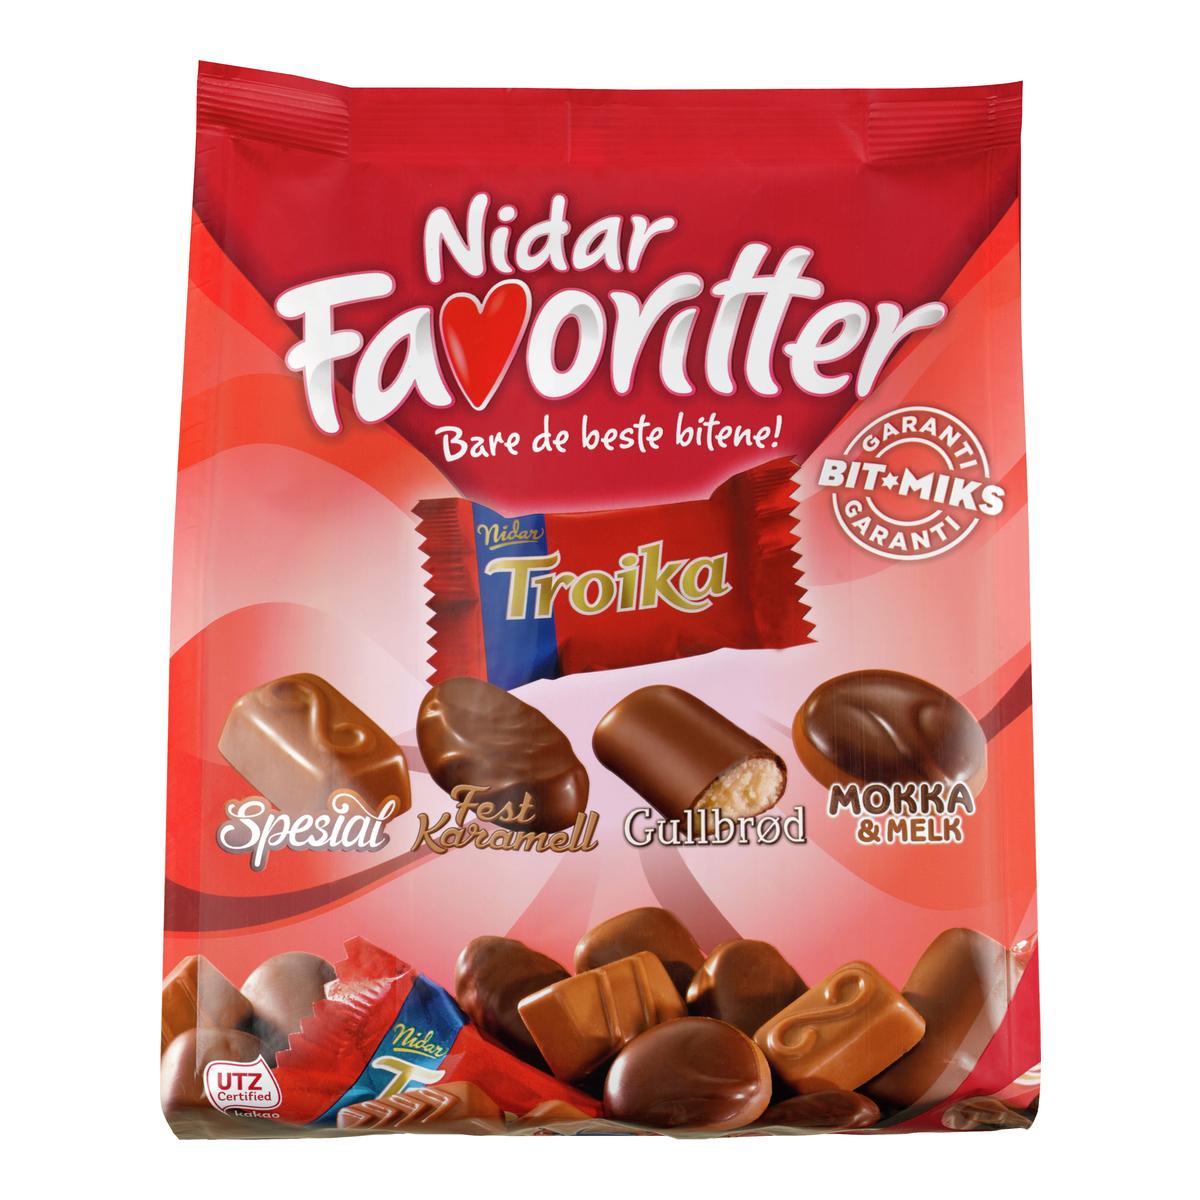 Nidar Favoritter Troika-SJO515